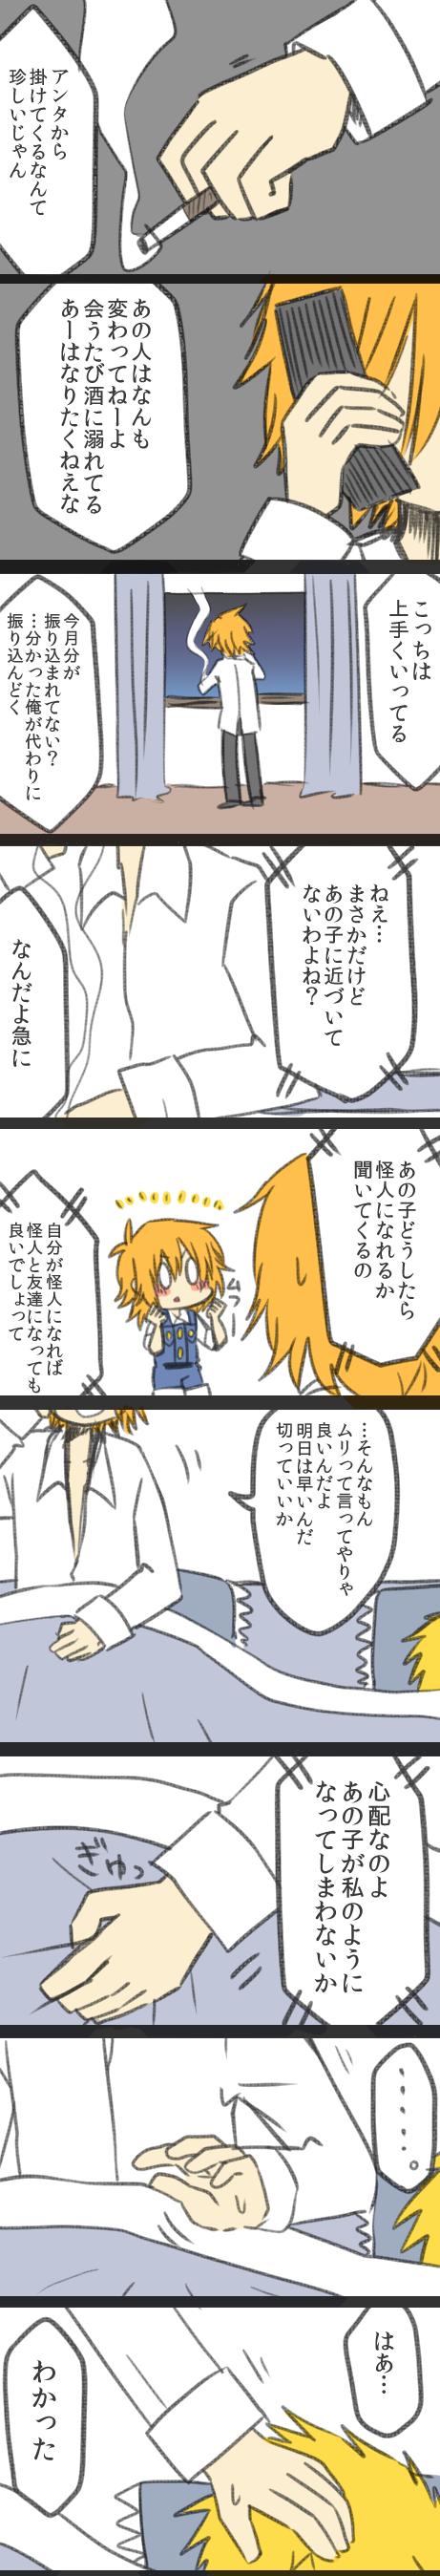 sankaku7